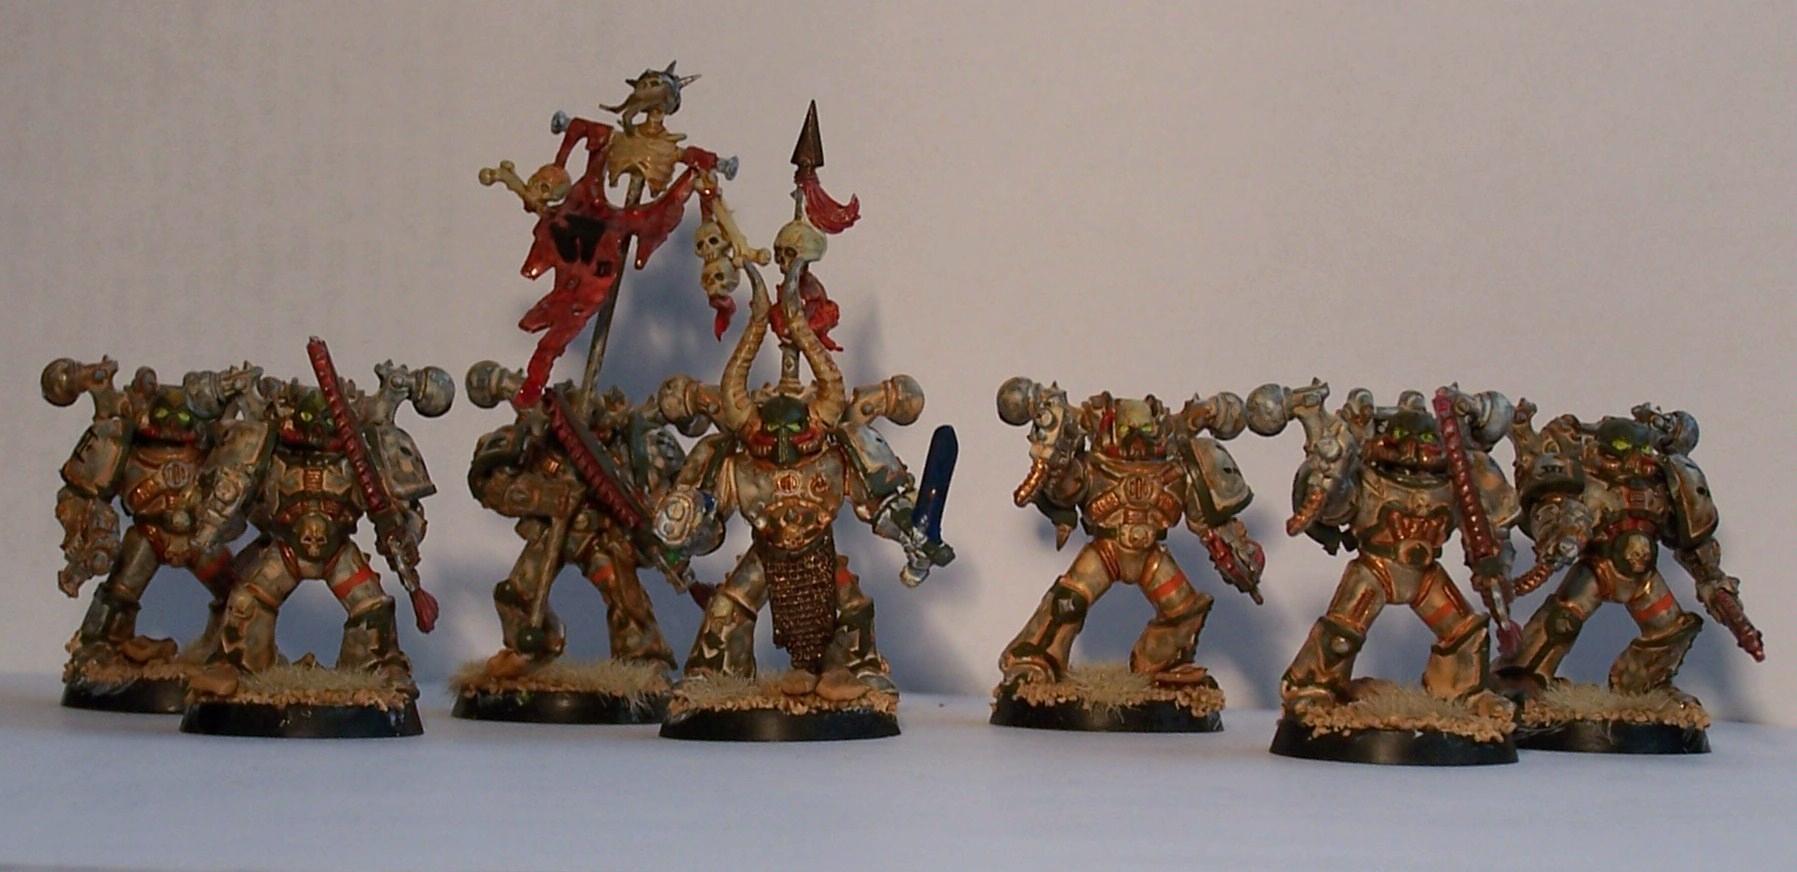 Chaos, Chaos Space Marines, Nurgle, Silvermk2, Warhammer 40,000